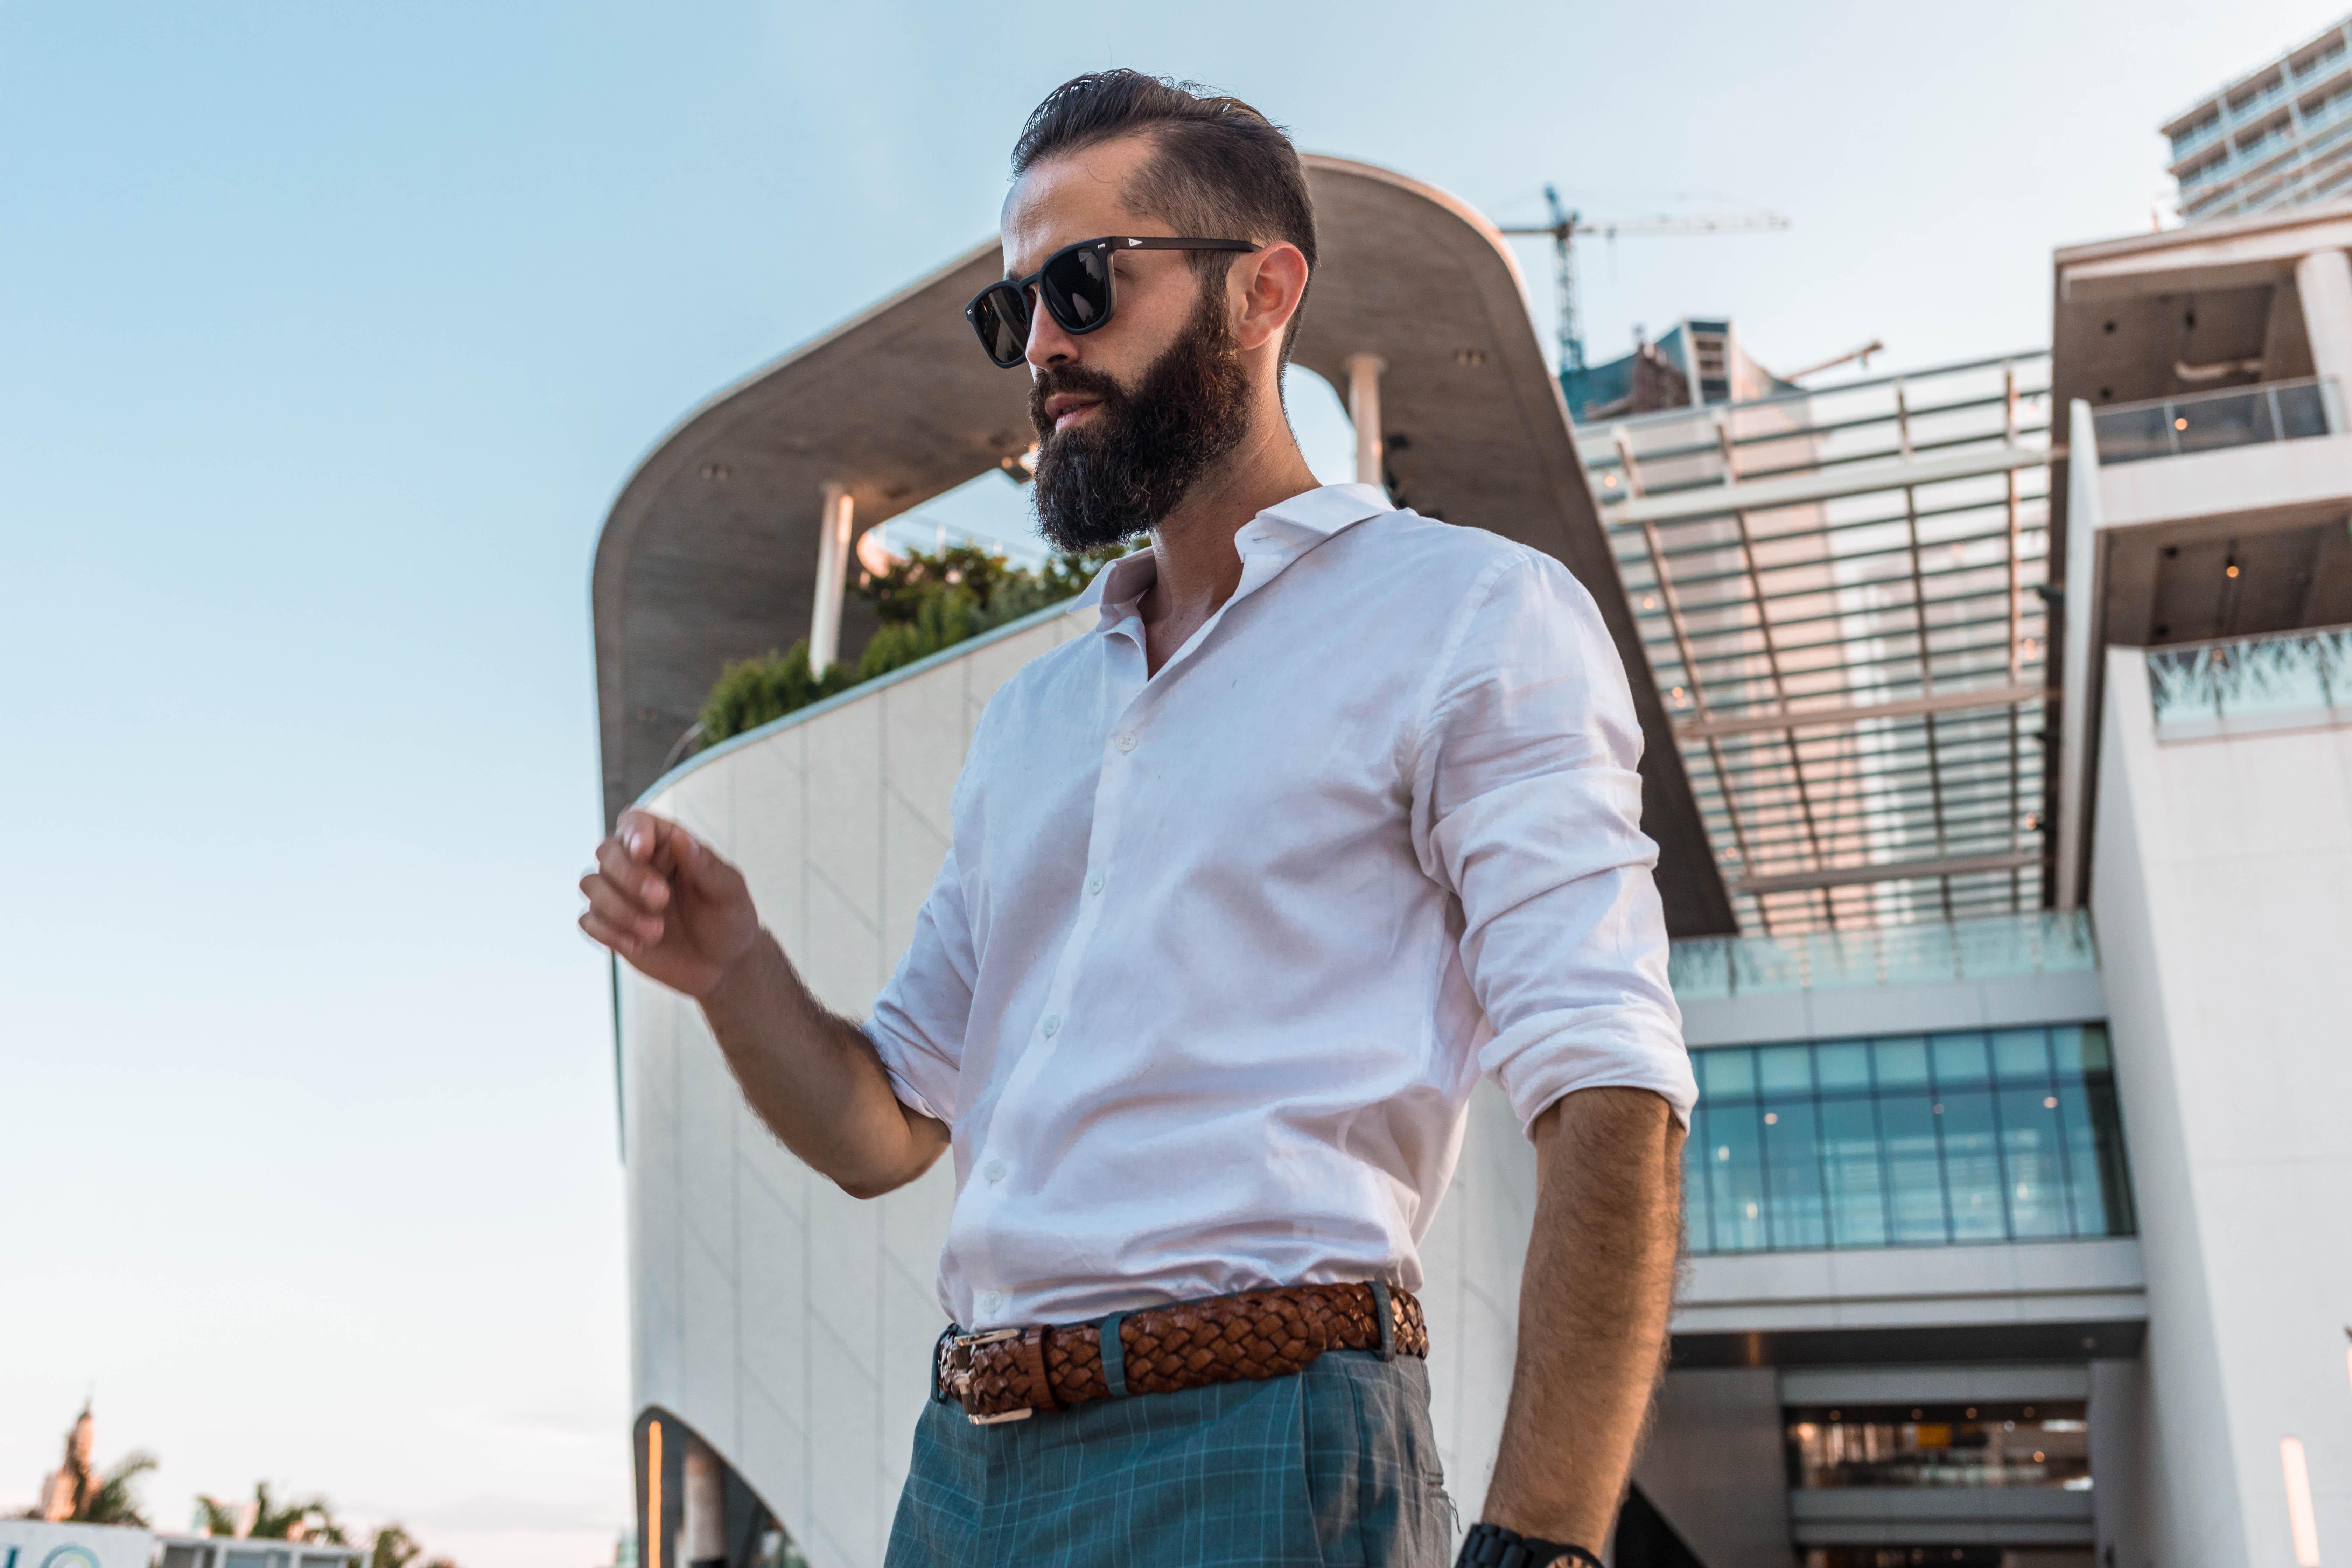 Michael Checkers Men's Fashion Blogger in downtown Miami modeling Topman menswear look